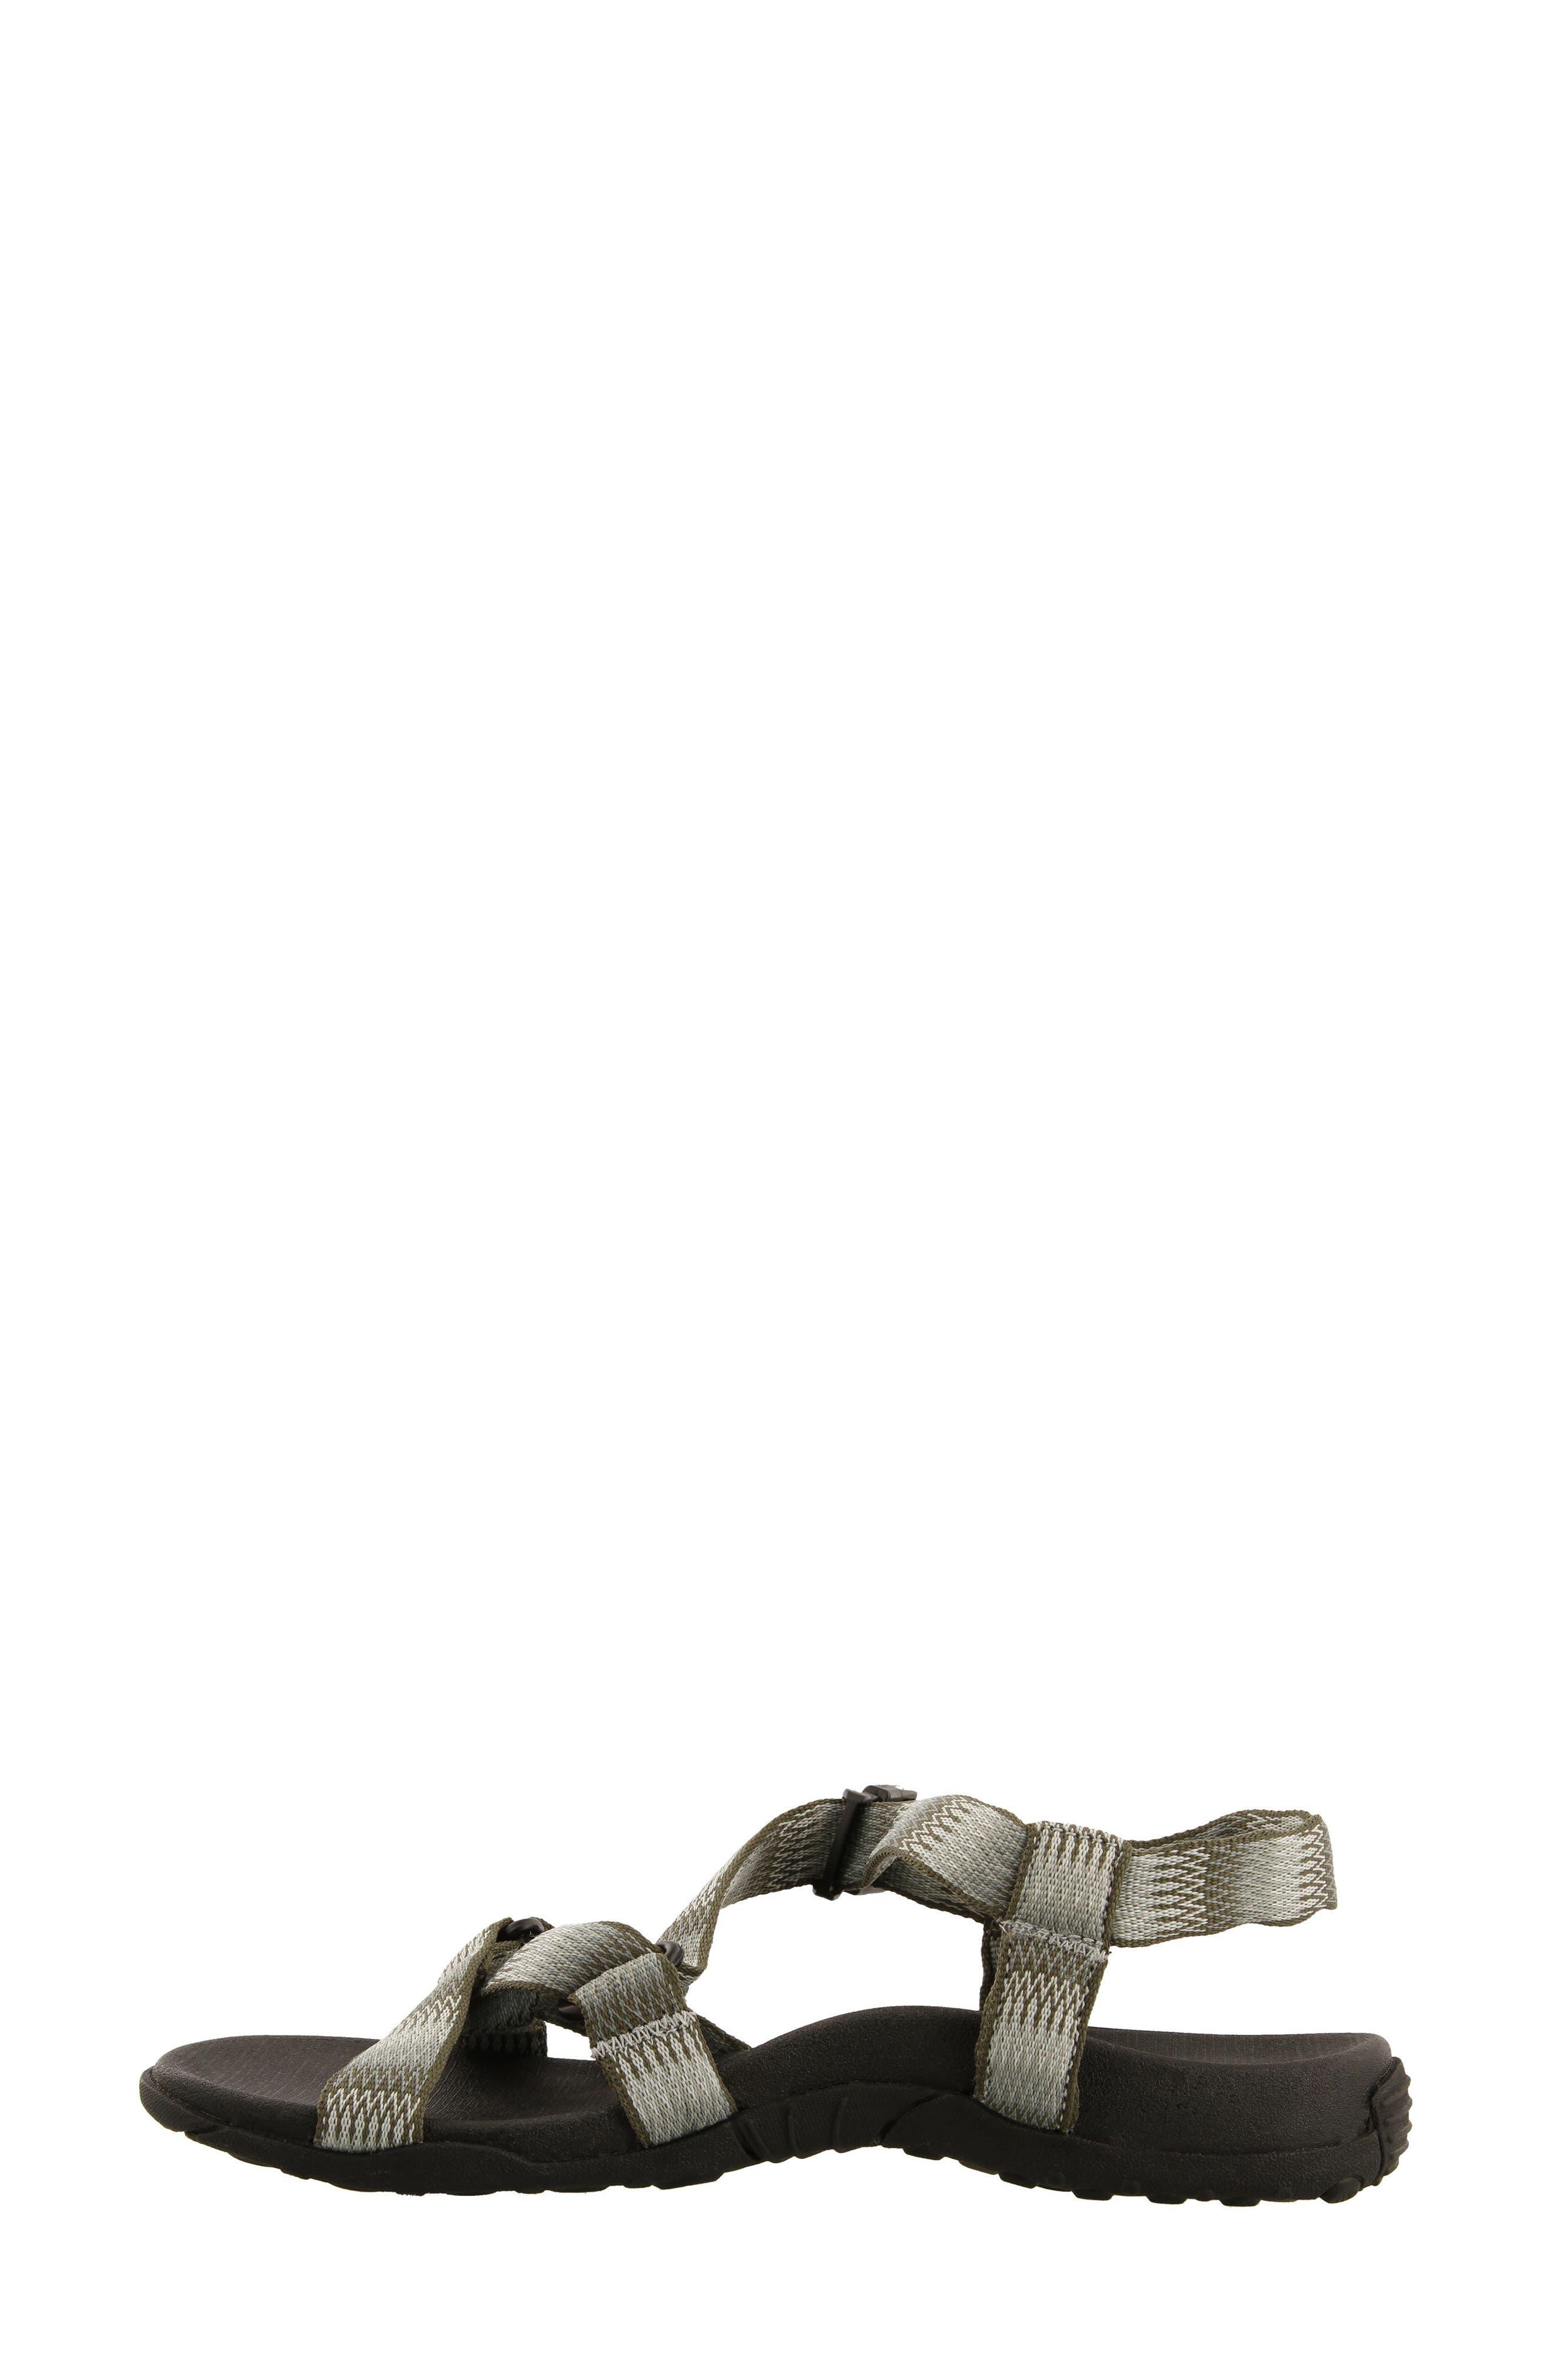 New Wave Sandal,                             Alternate thumbnail 5, color,                             SAGE FABRIC